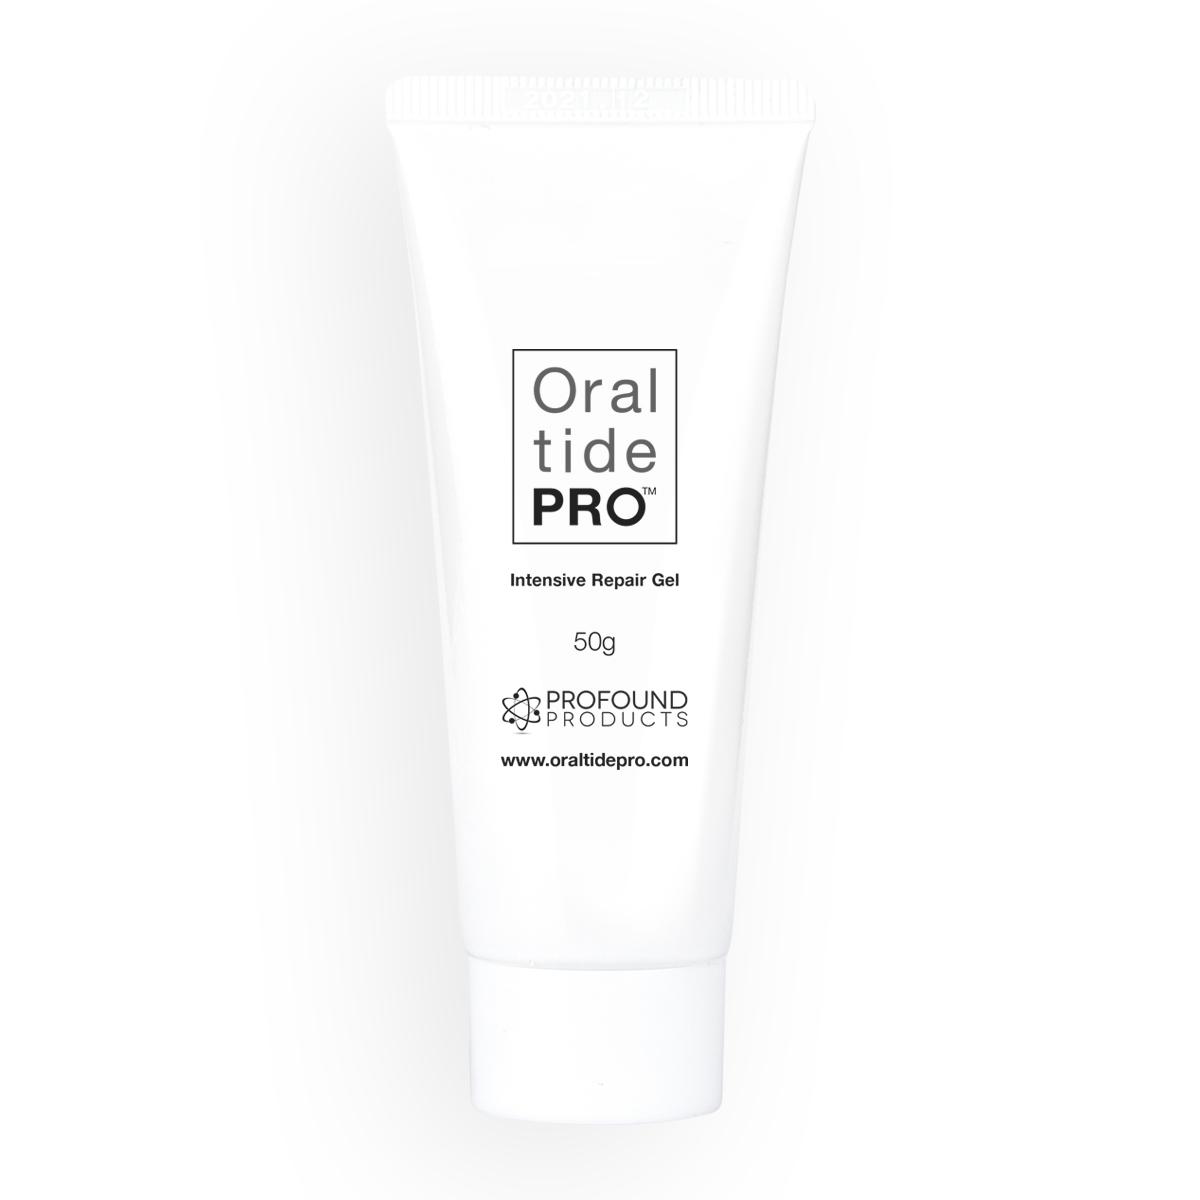 Oraltide-Pro™ Intensive Repair Gel Bottle